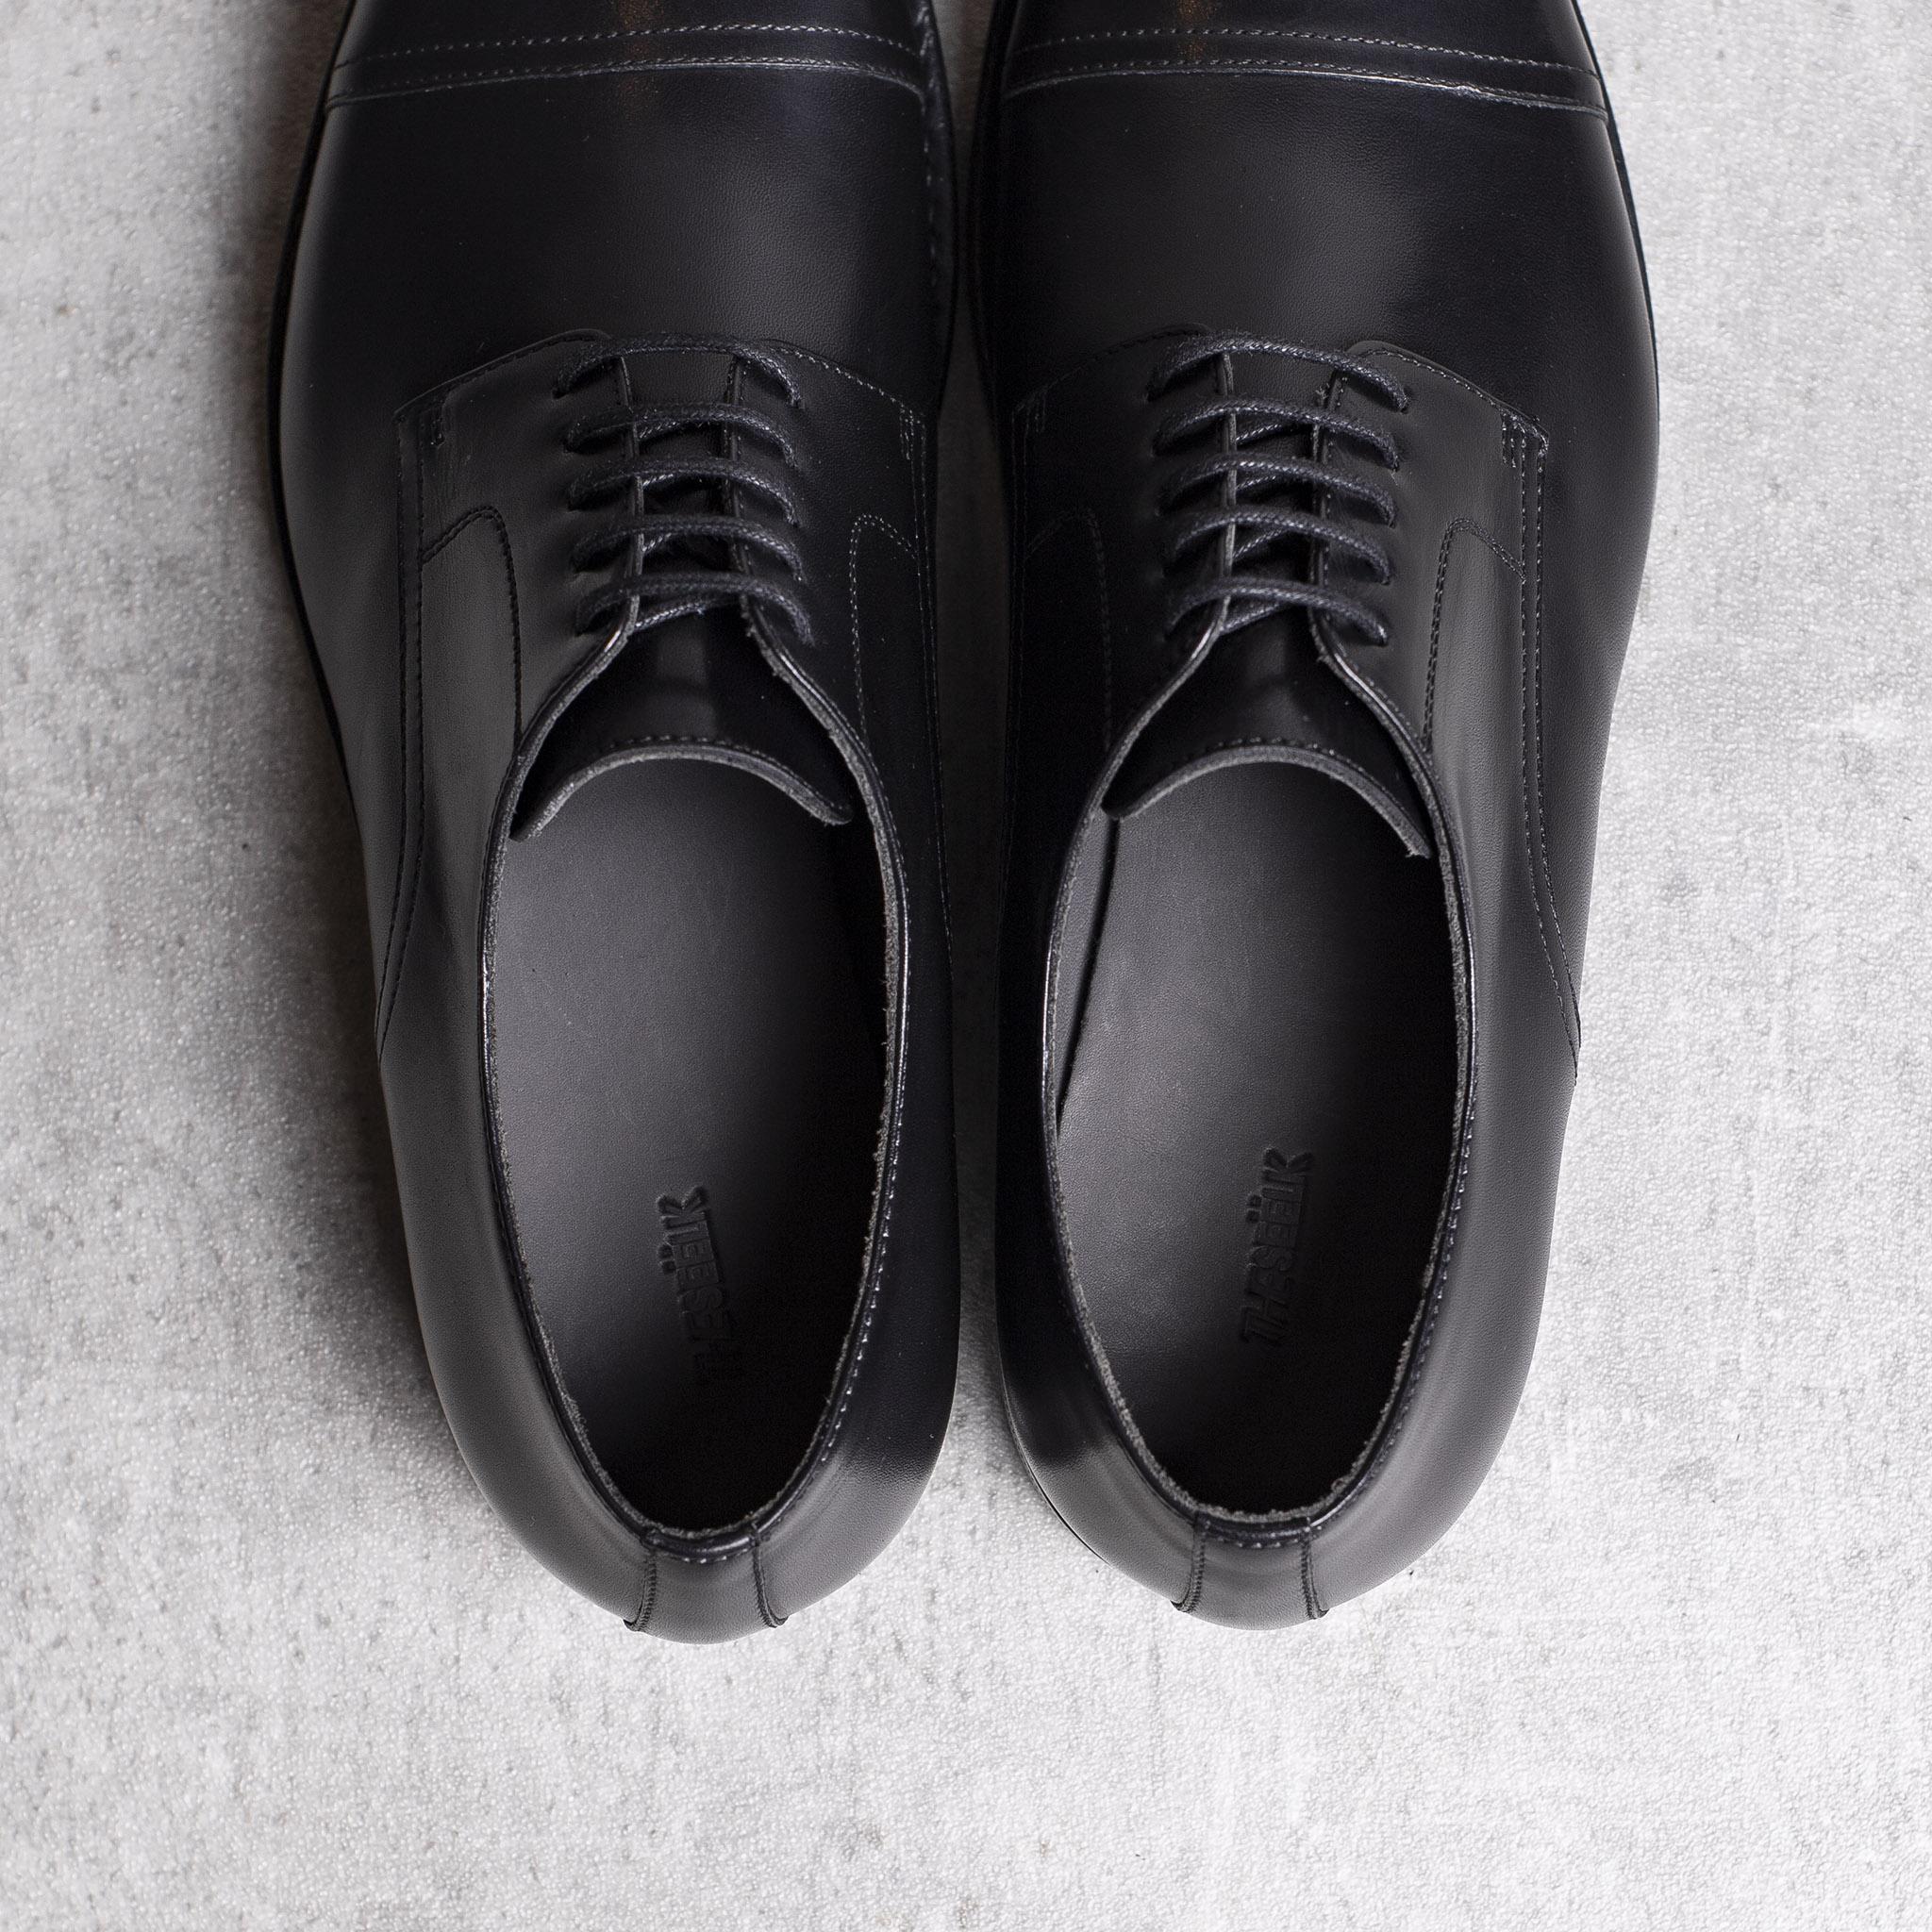 DERBY · 0649 Black leather The Seëlk 4